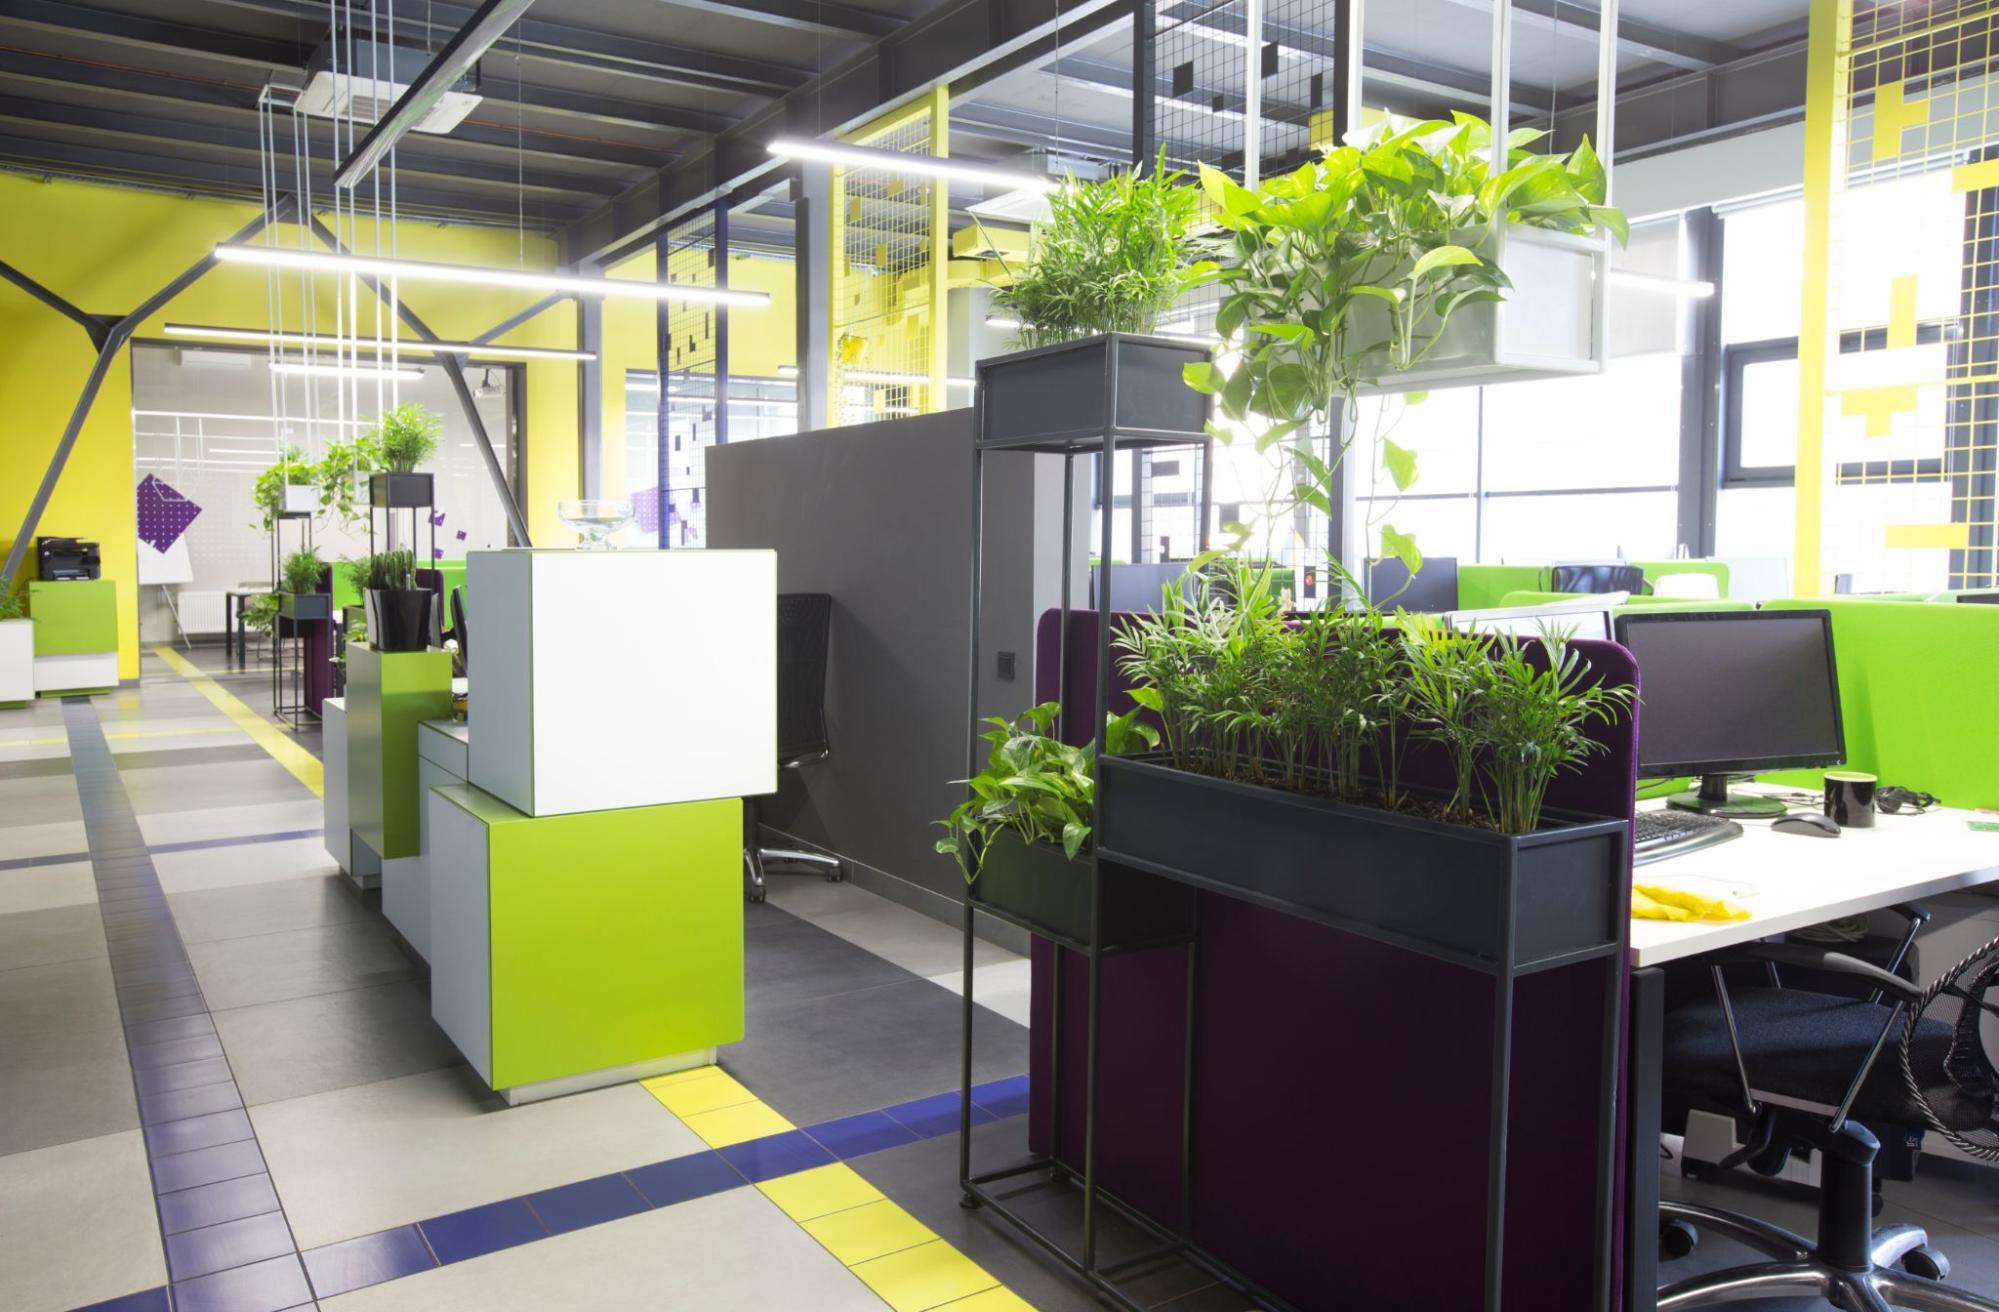 Establishing a Greener Workplace